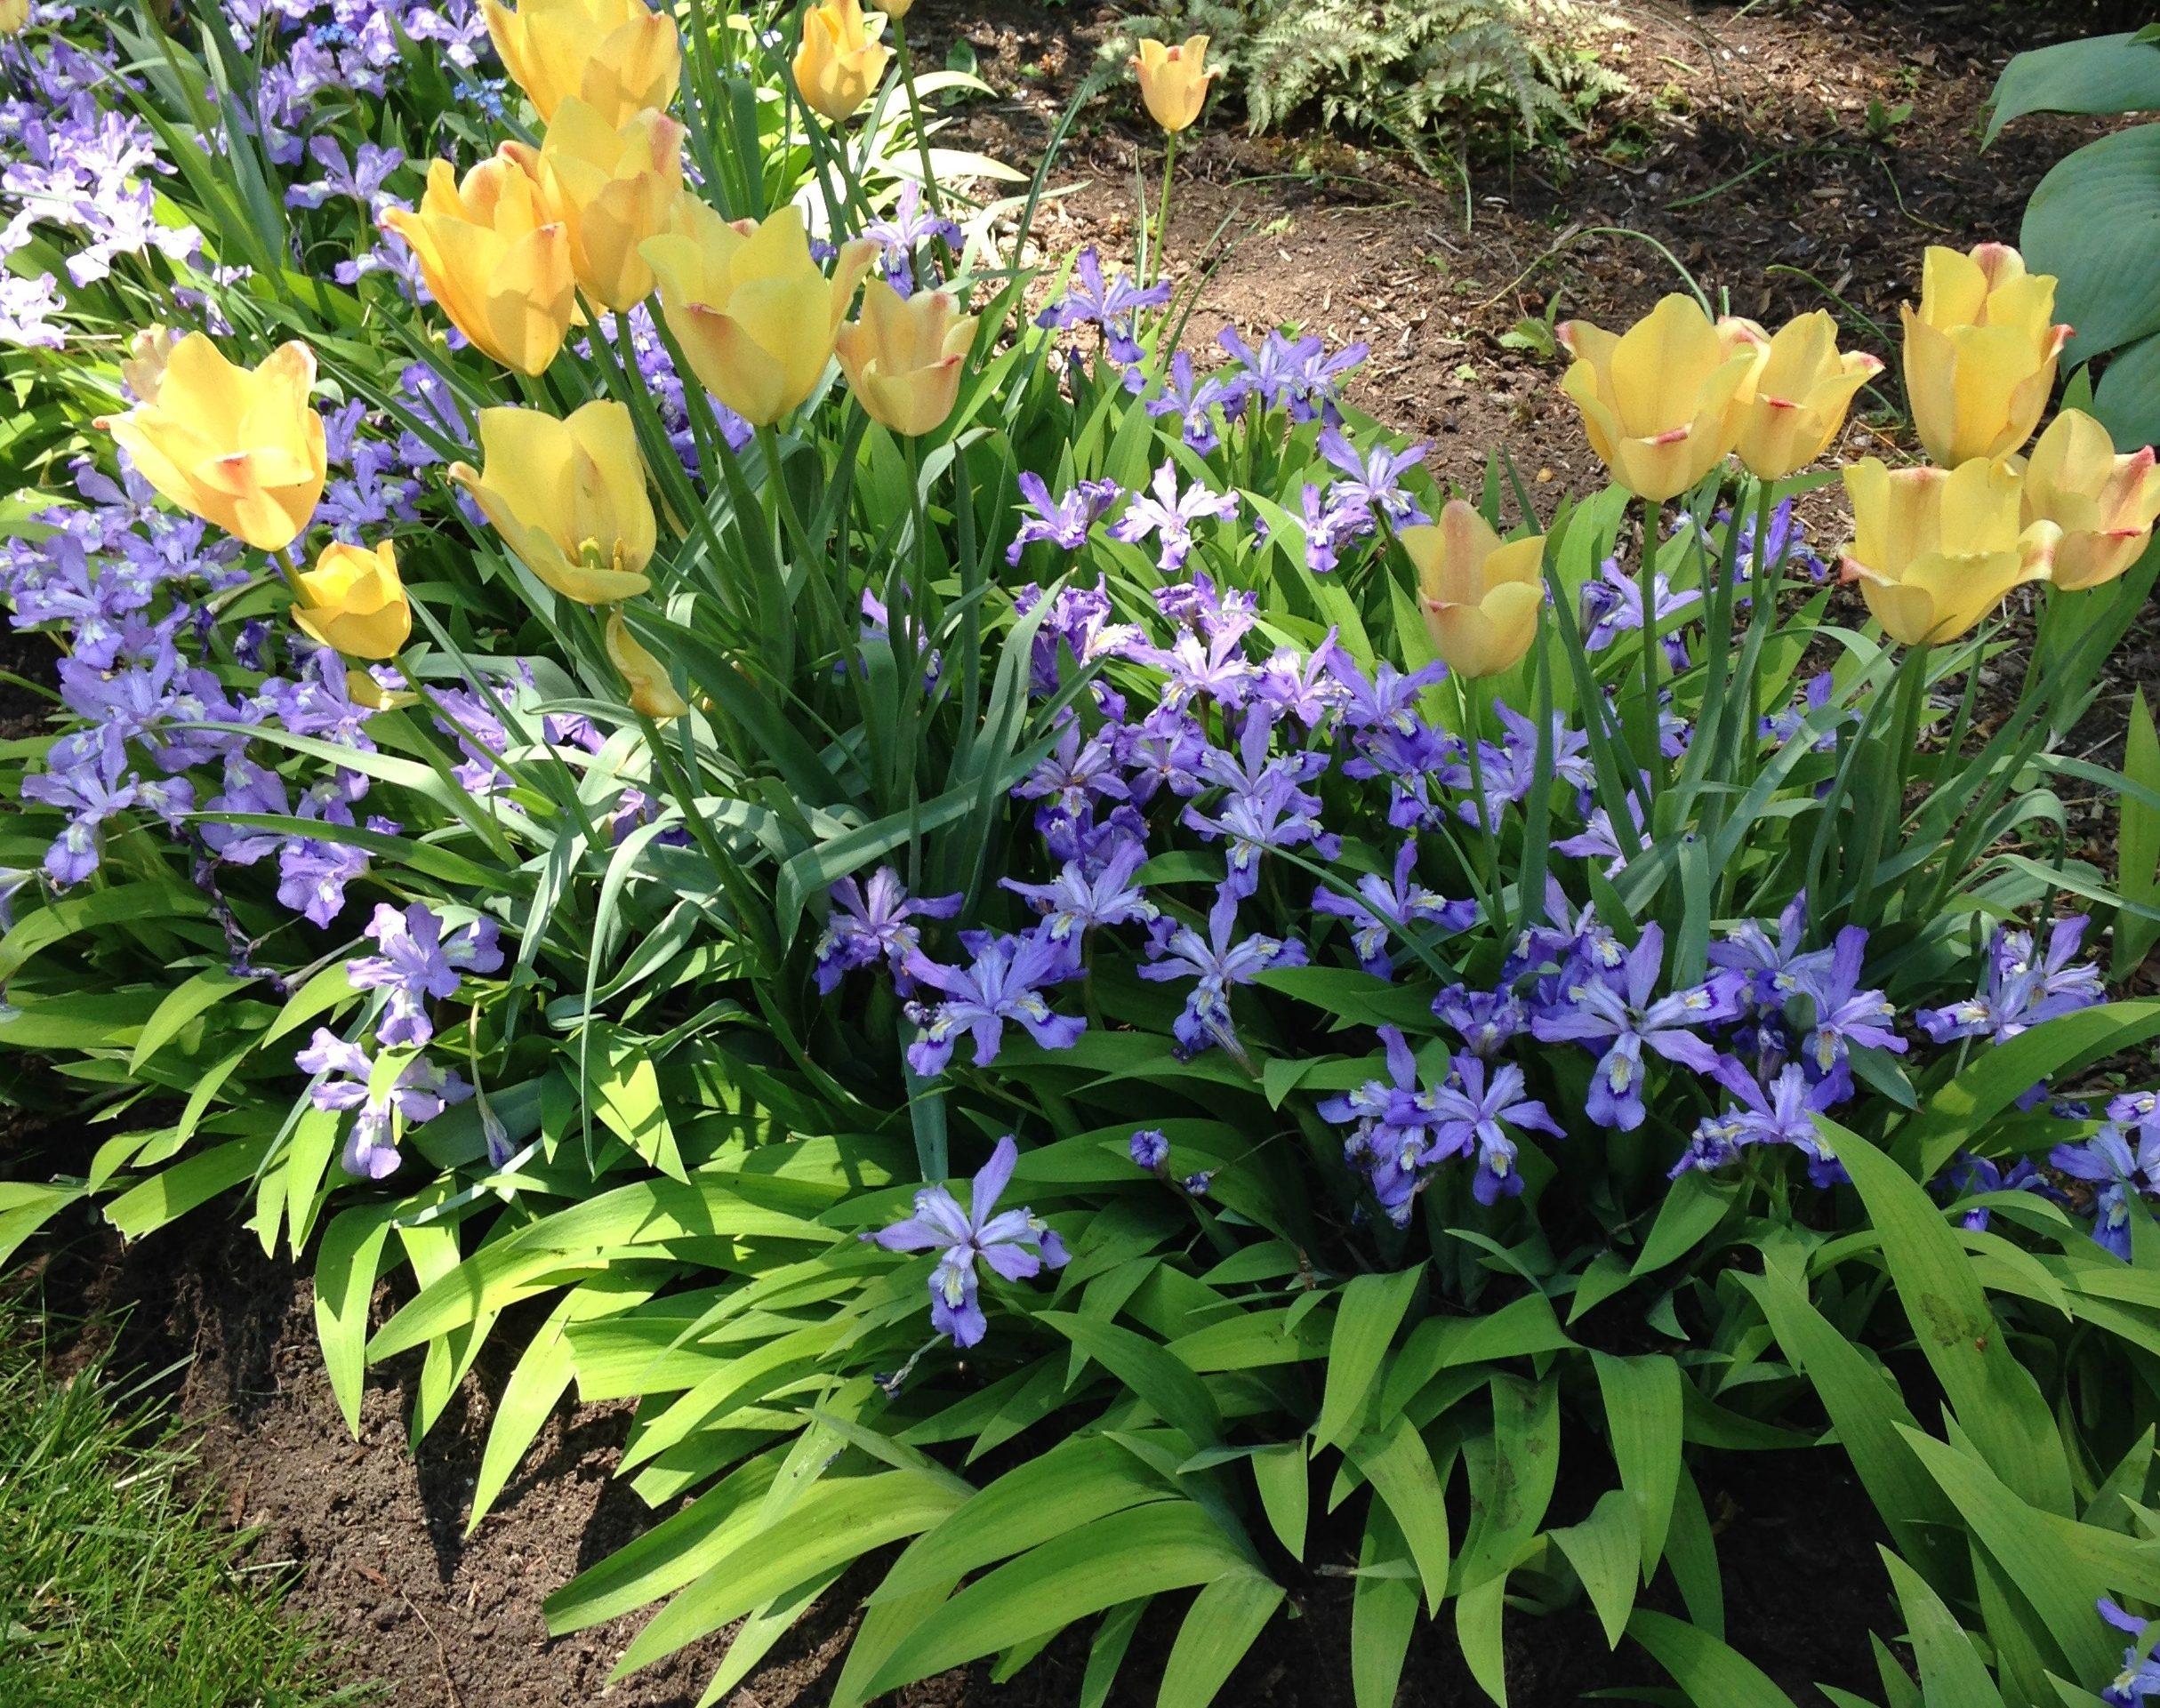 Iris-Tulips-e1520972137882